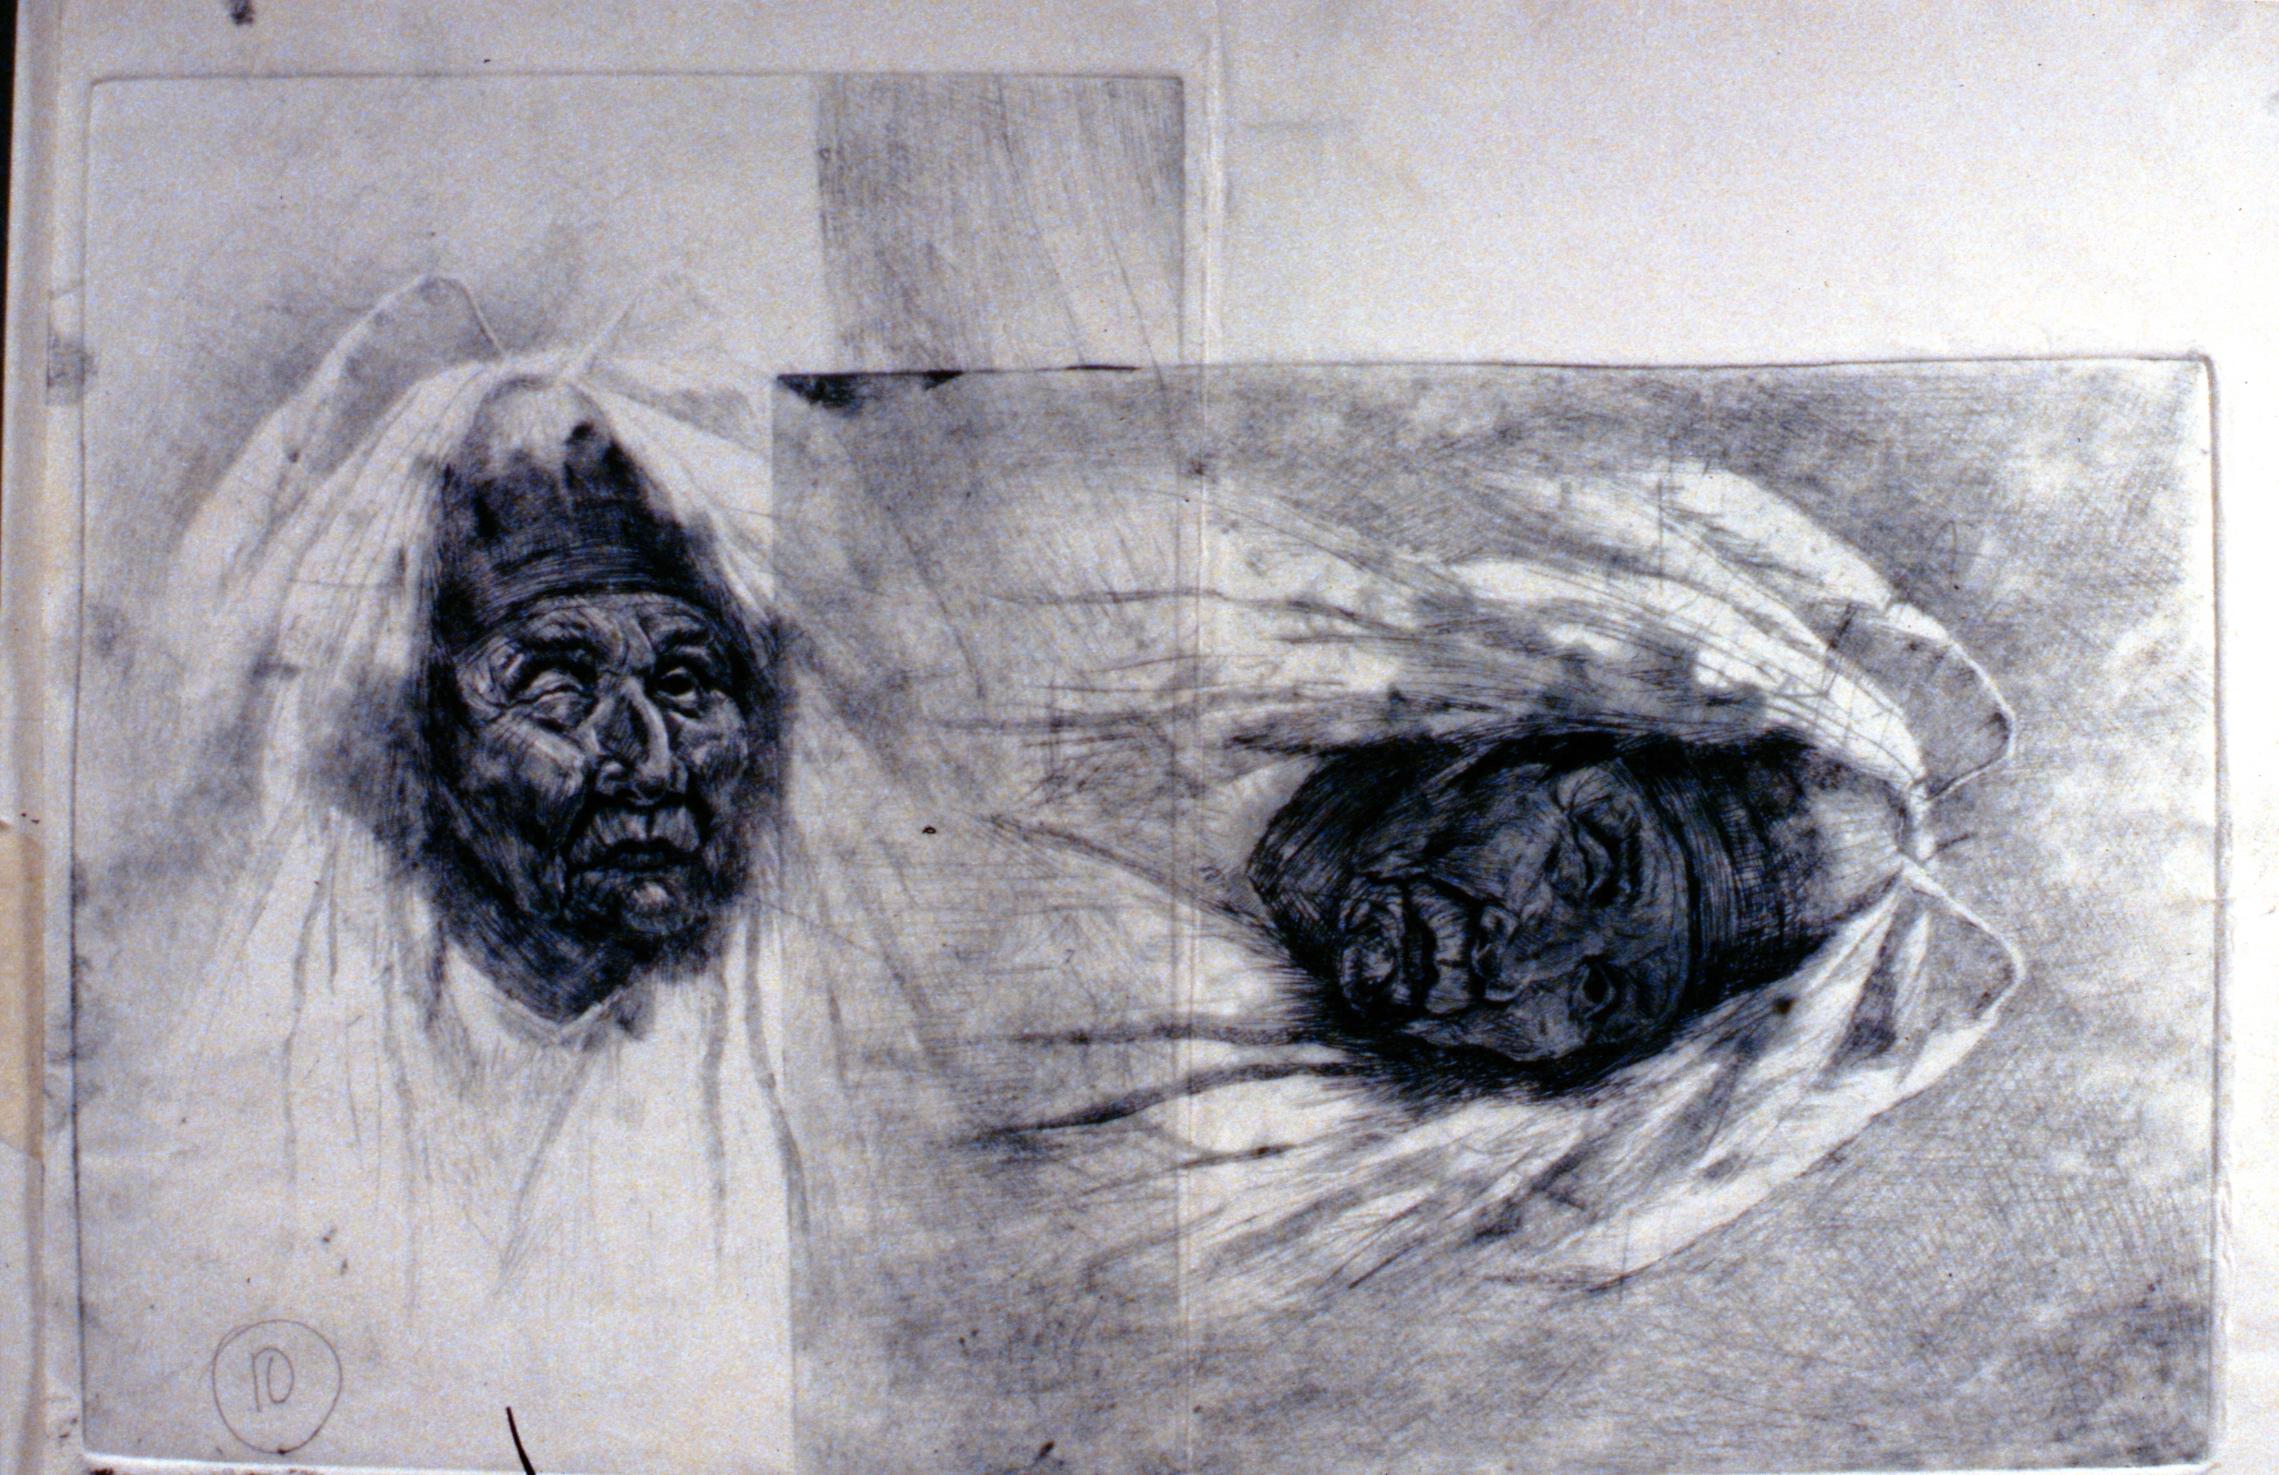 Shaman , 1980, Minn Sjølseth, artist proof with two images, 20 x 25cm, 1996.02.13